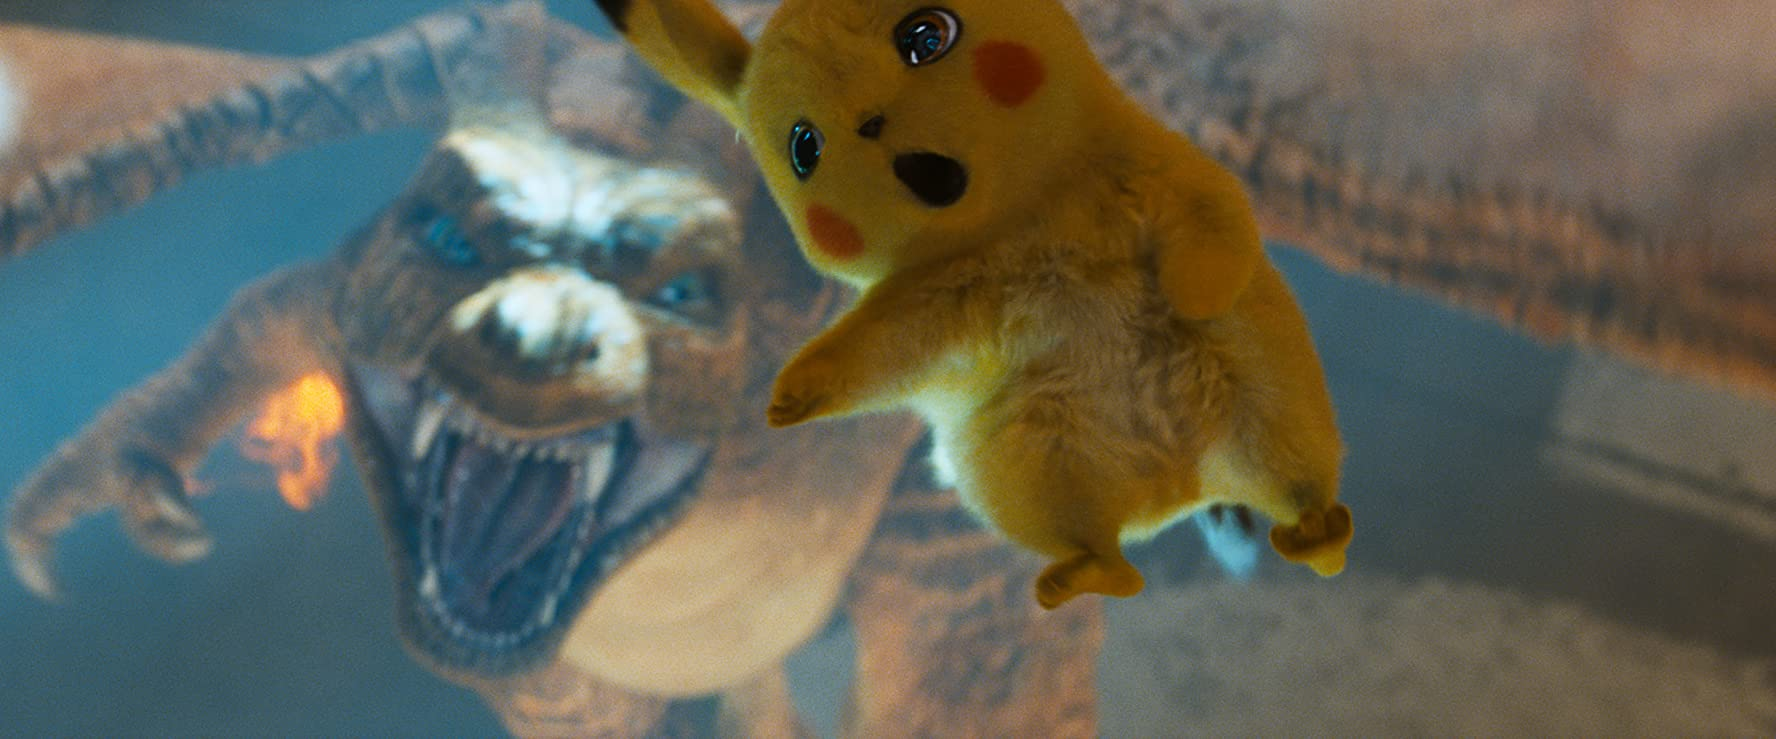 Ryan Reynolds in Pokémon Detective Pikachu (2019)